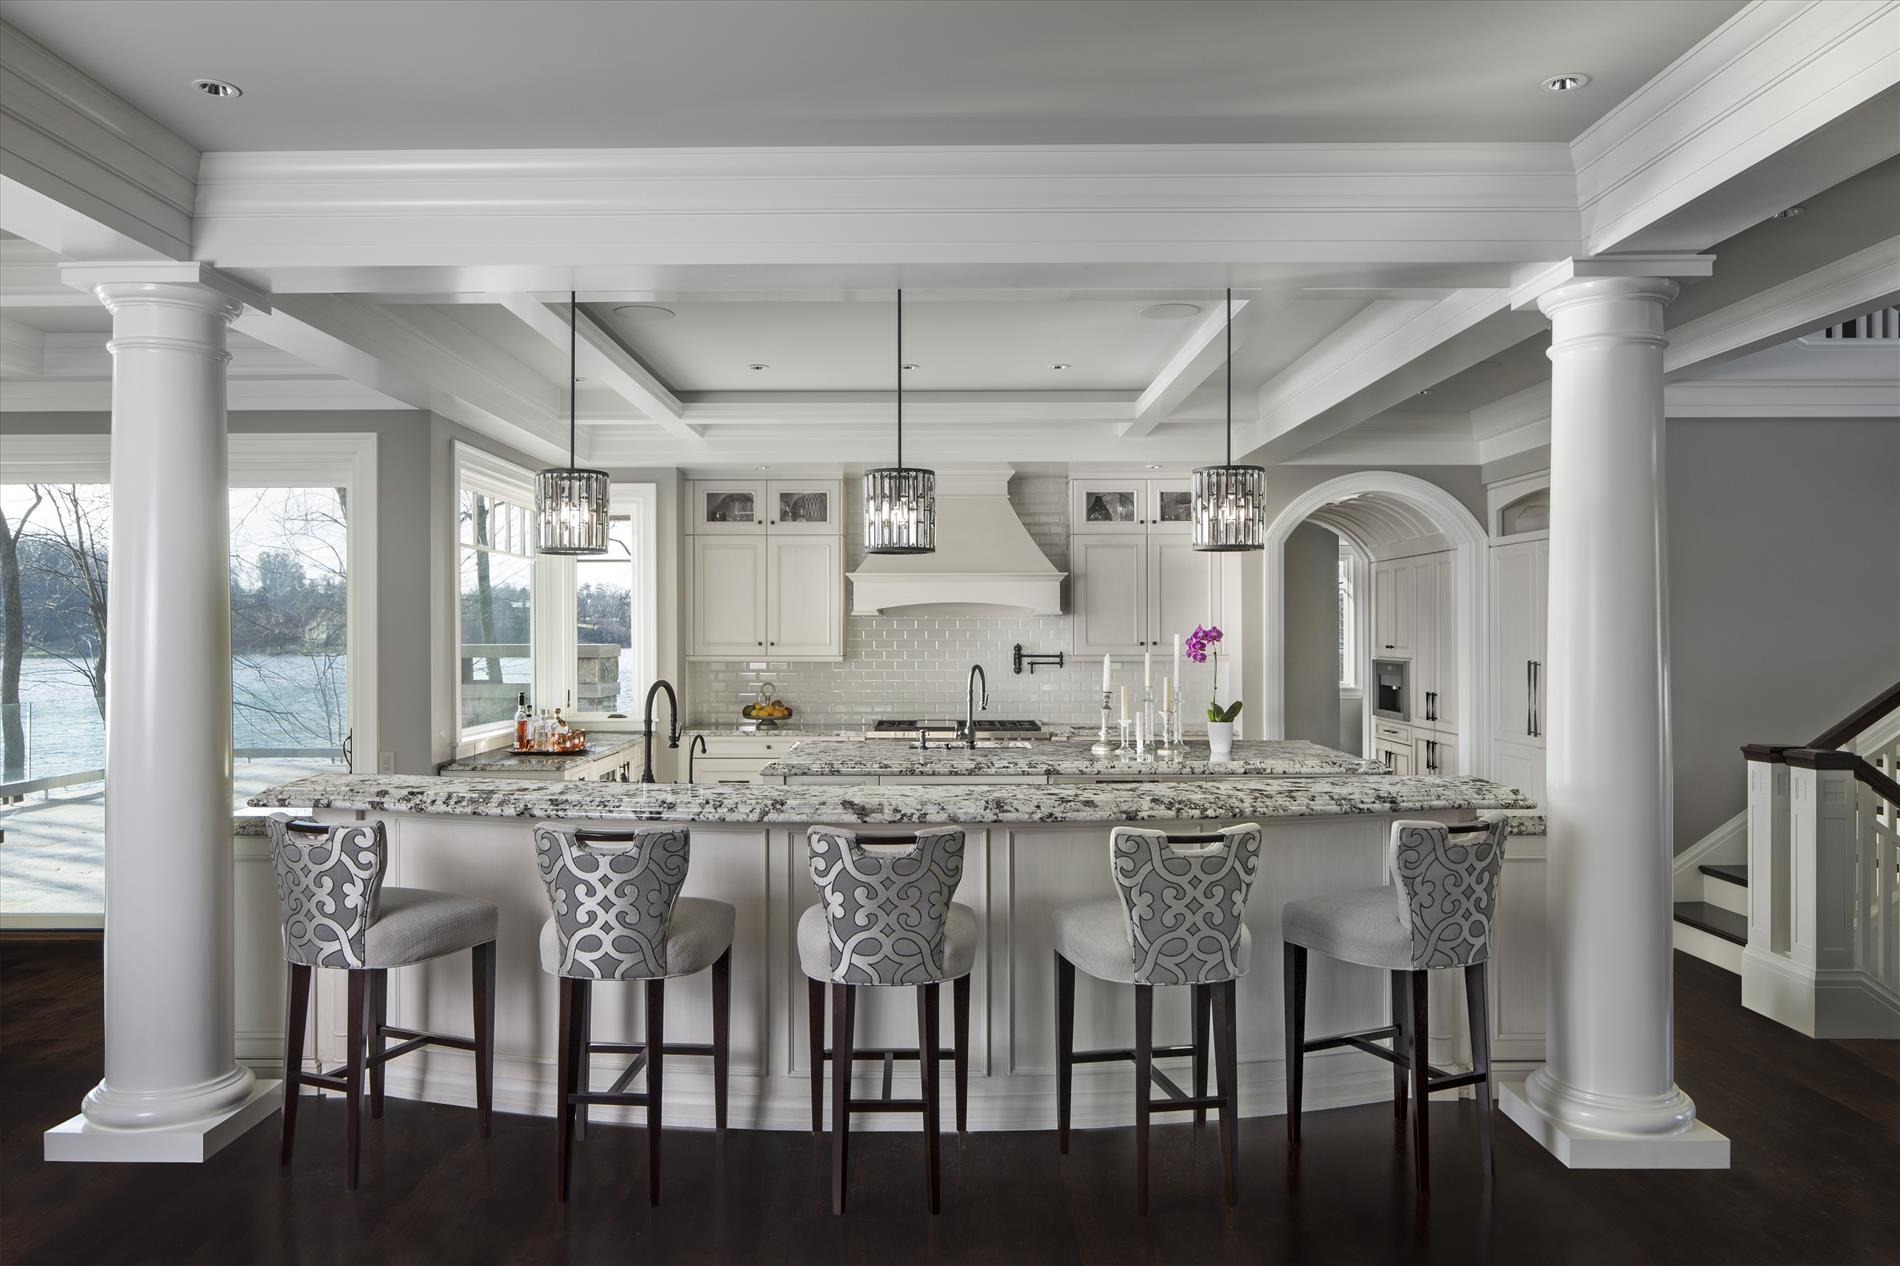 kitchen design contest – trevarrow, inc. of auburn hills, michigan